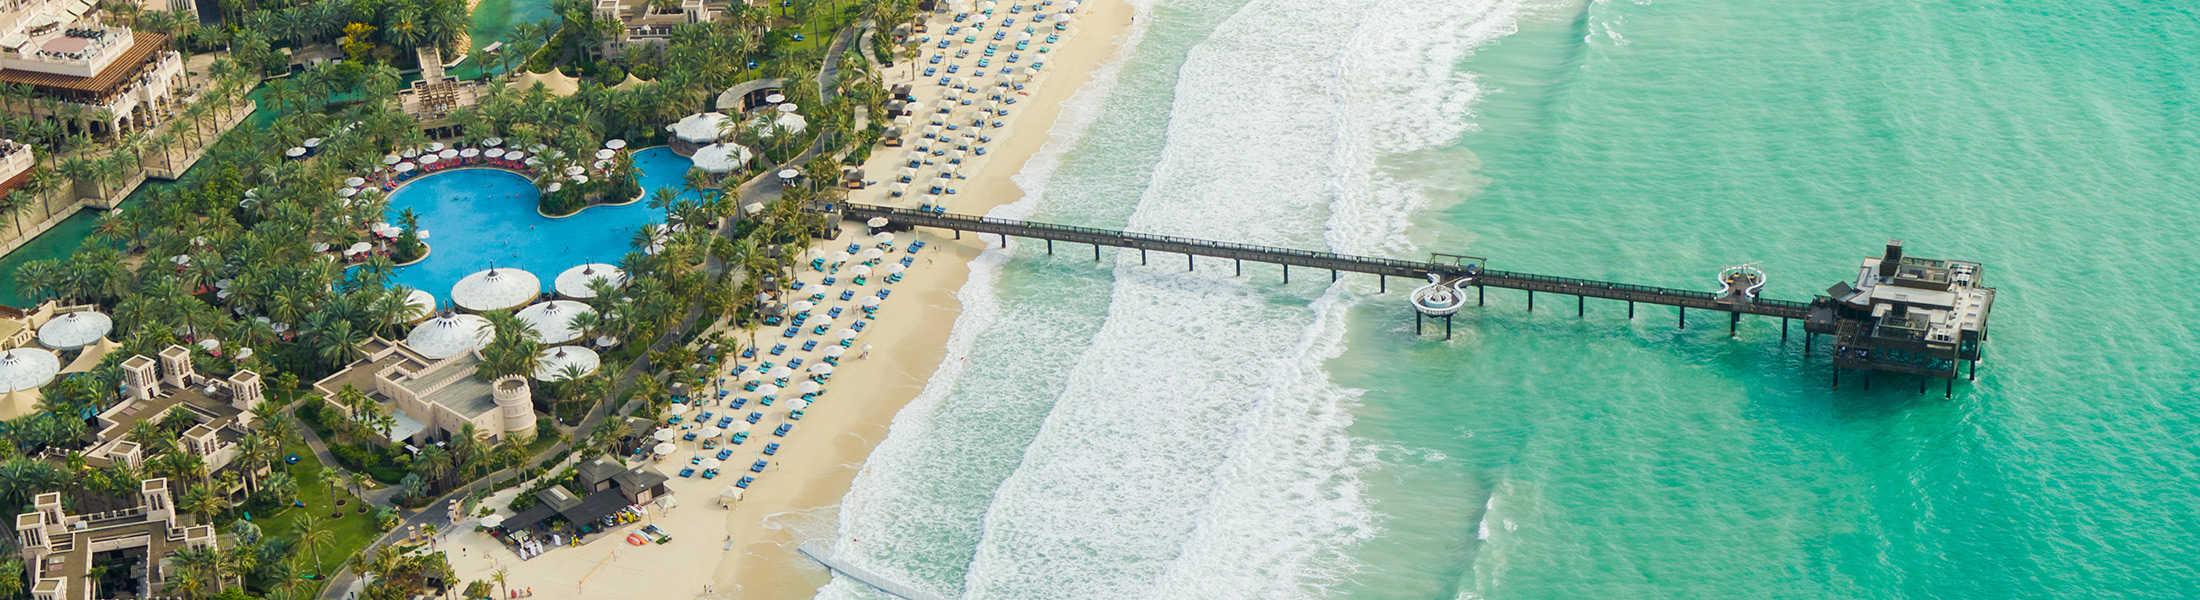 Aerial view of the private beach at Jumeirah Dar Al Masyaf